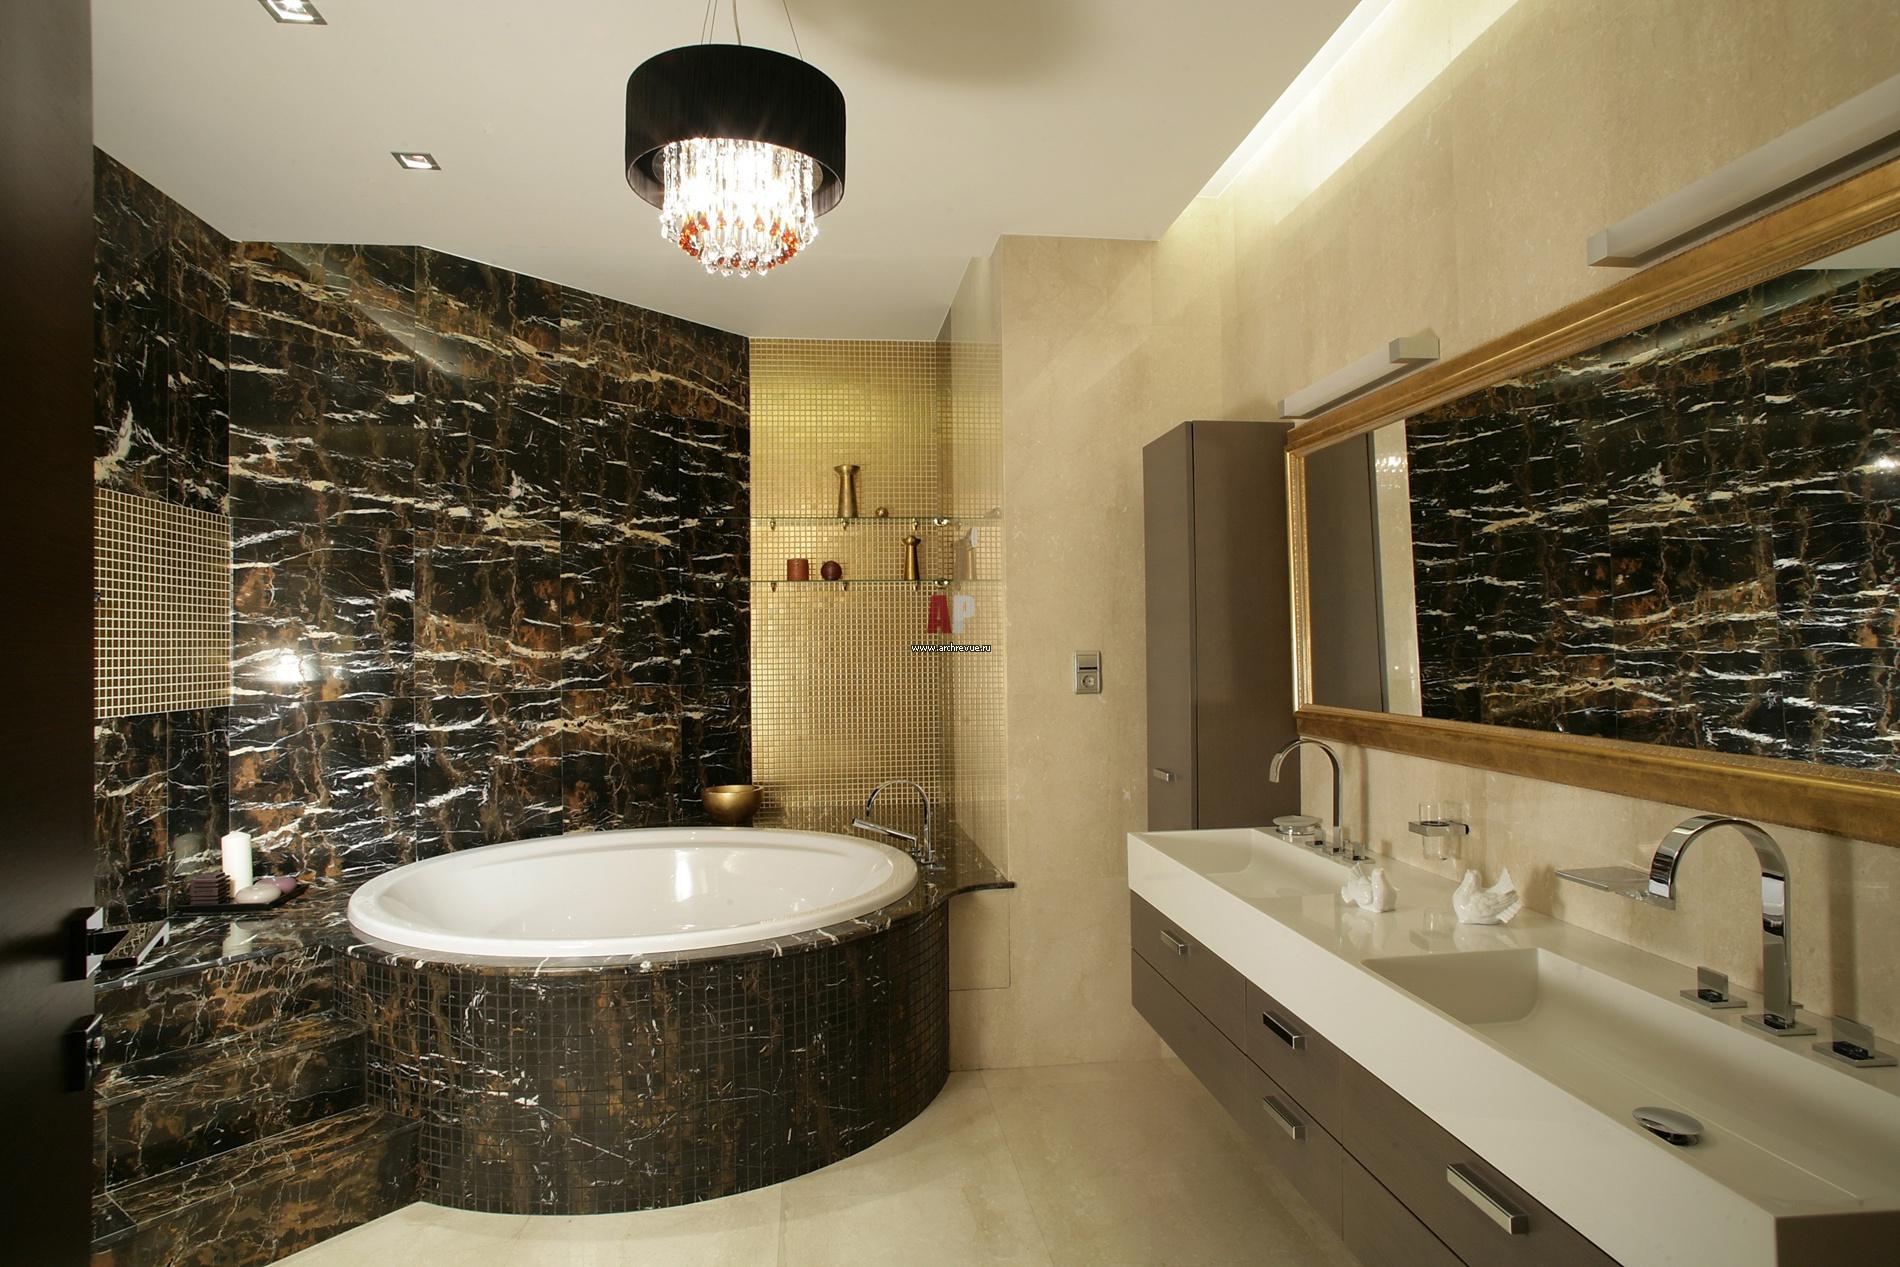 супружеская ванная комната